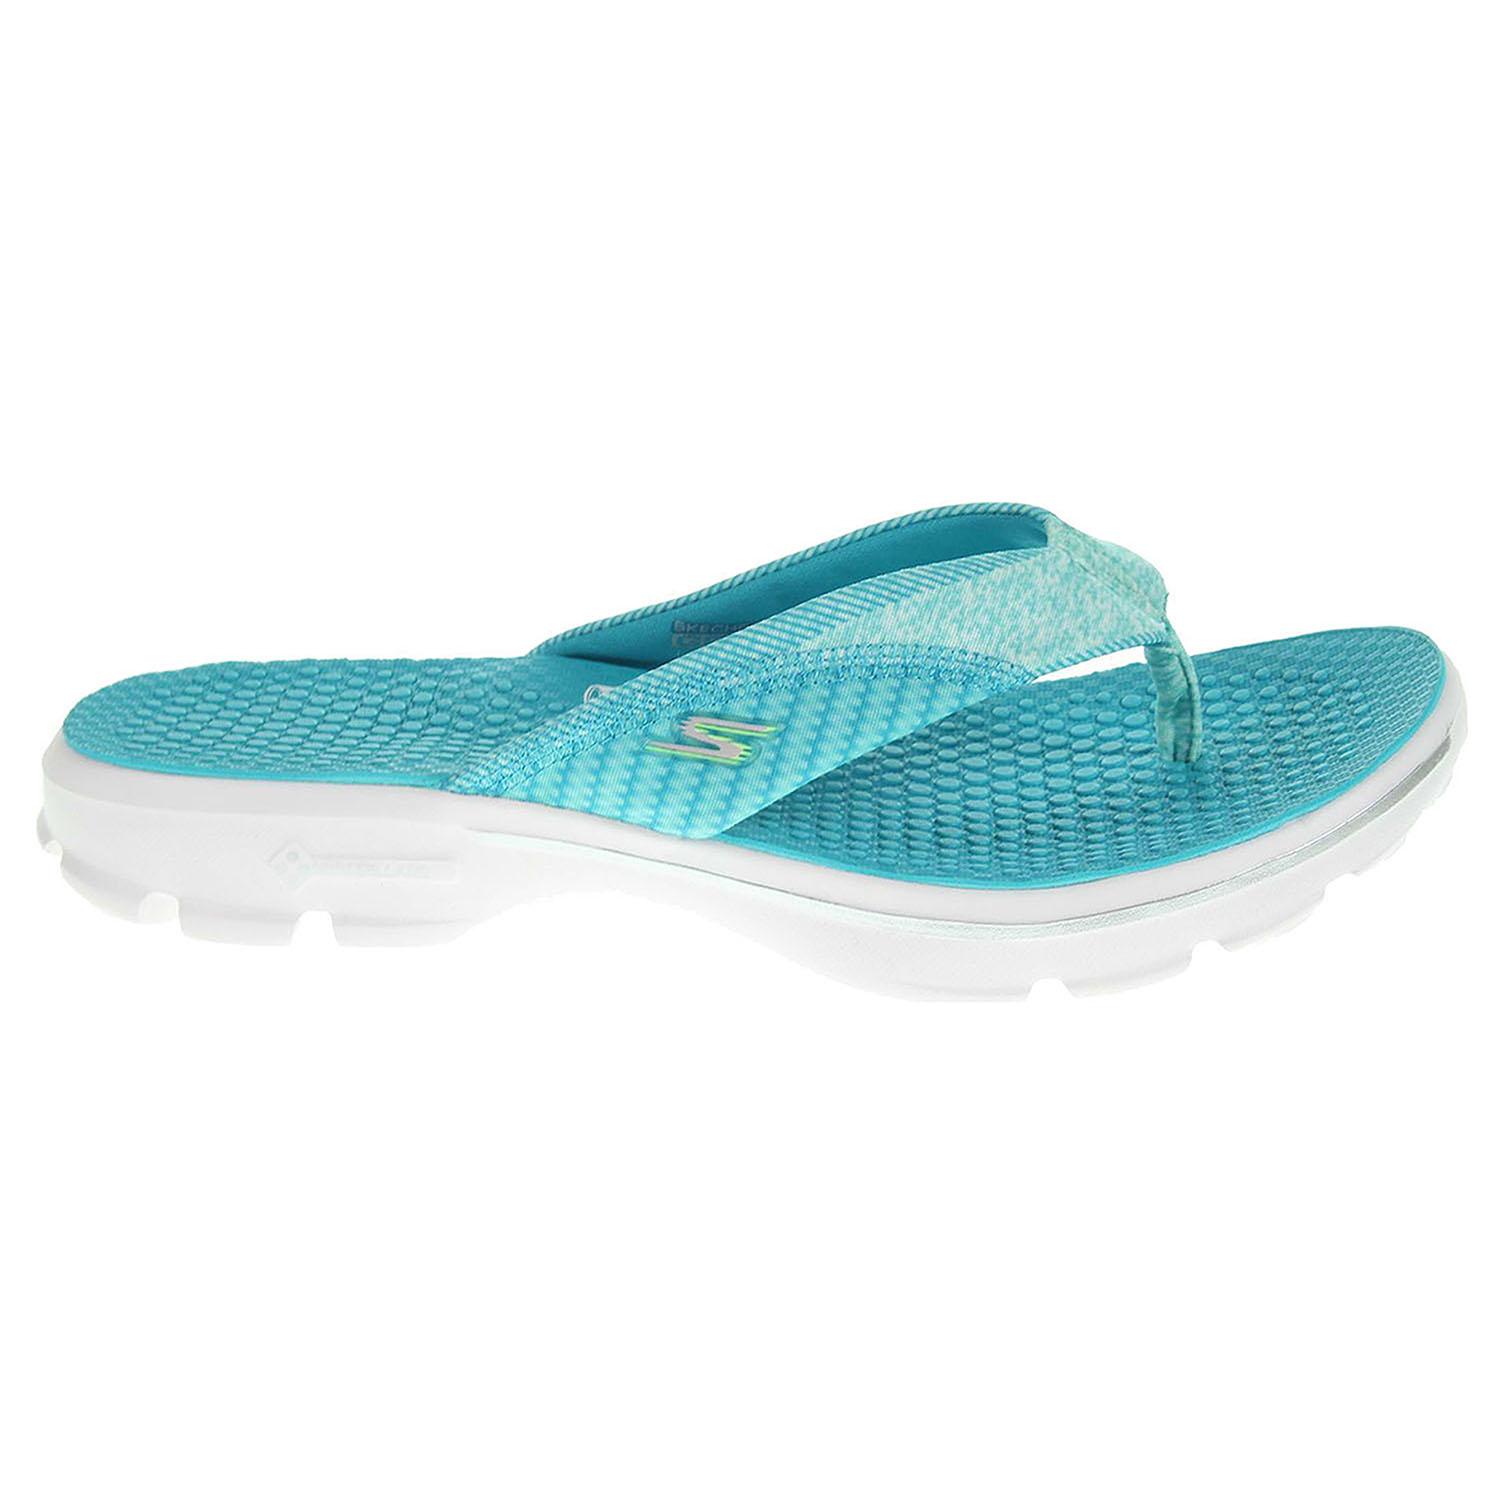 Ecco Skechers Go Walk-Pizazz turquoise 23700283